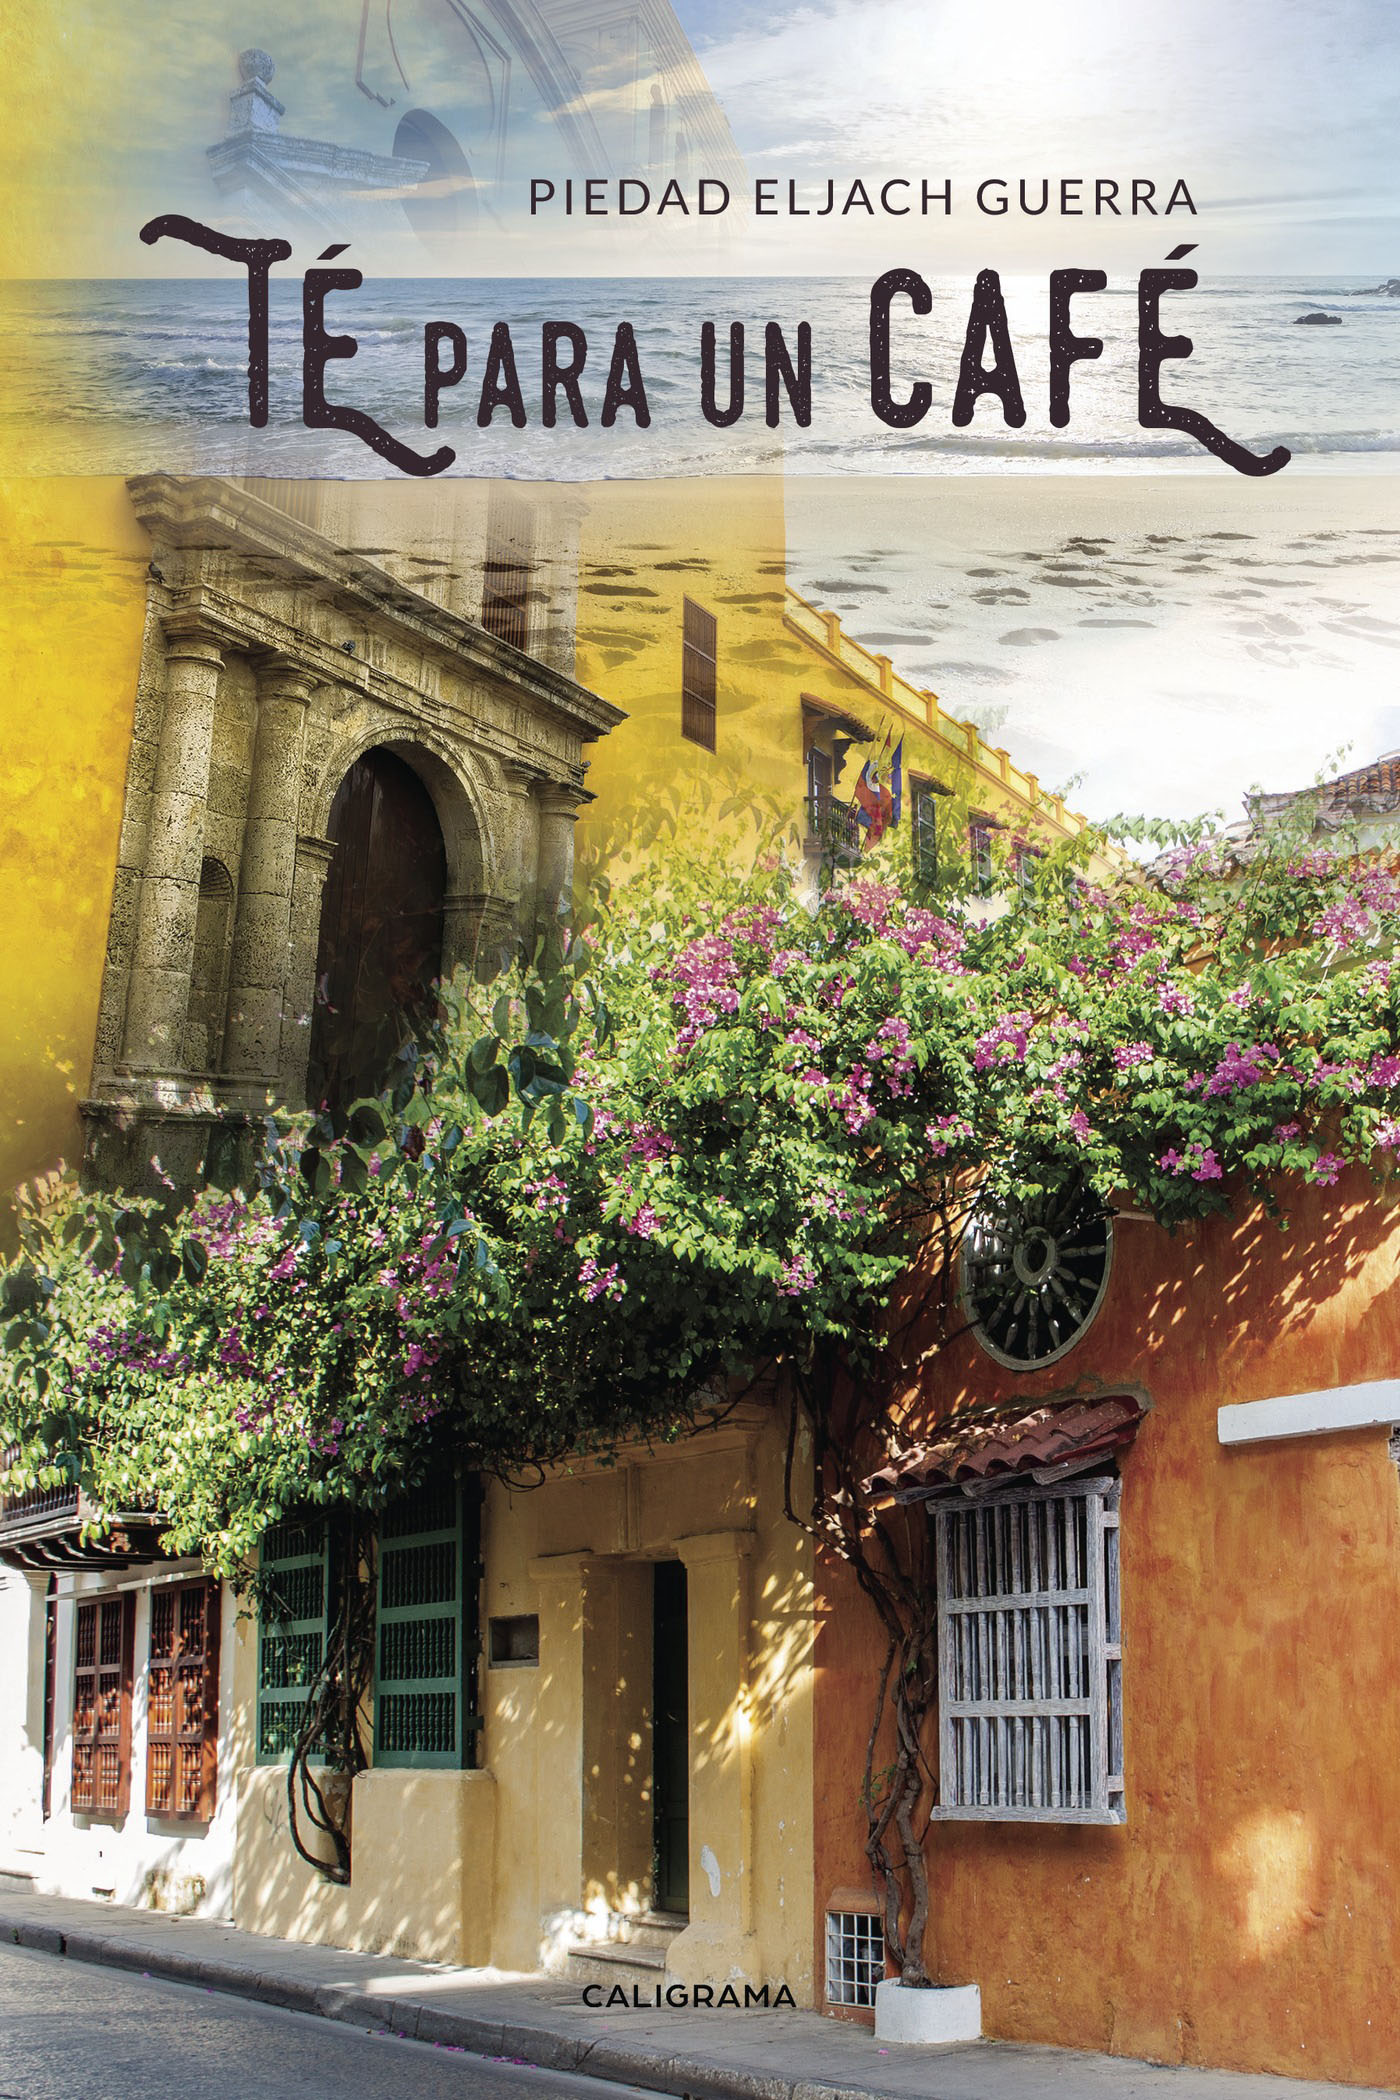 Un té para un café (Piedad Eljach Guerra, 2018)